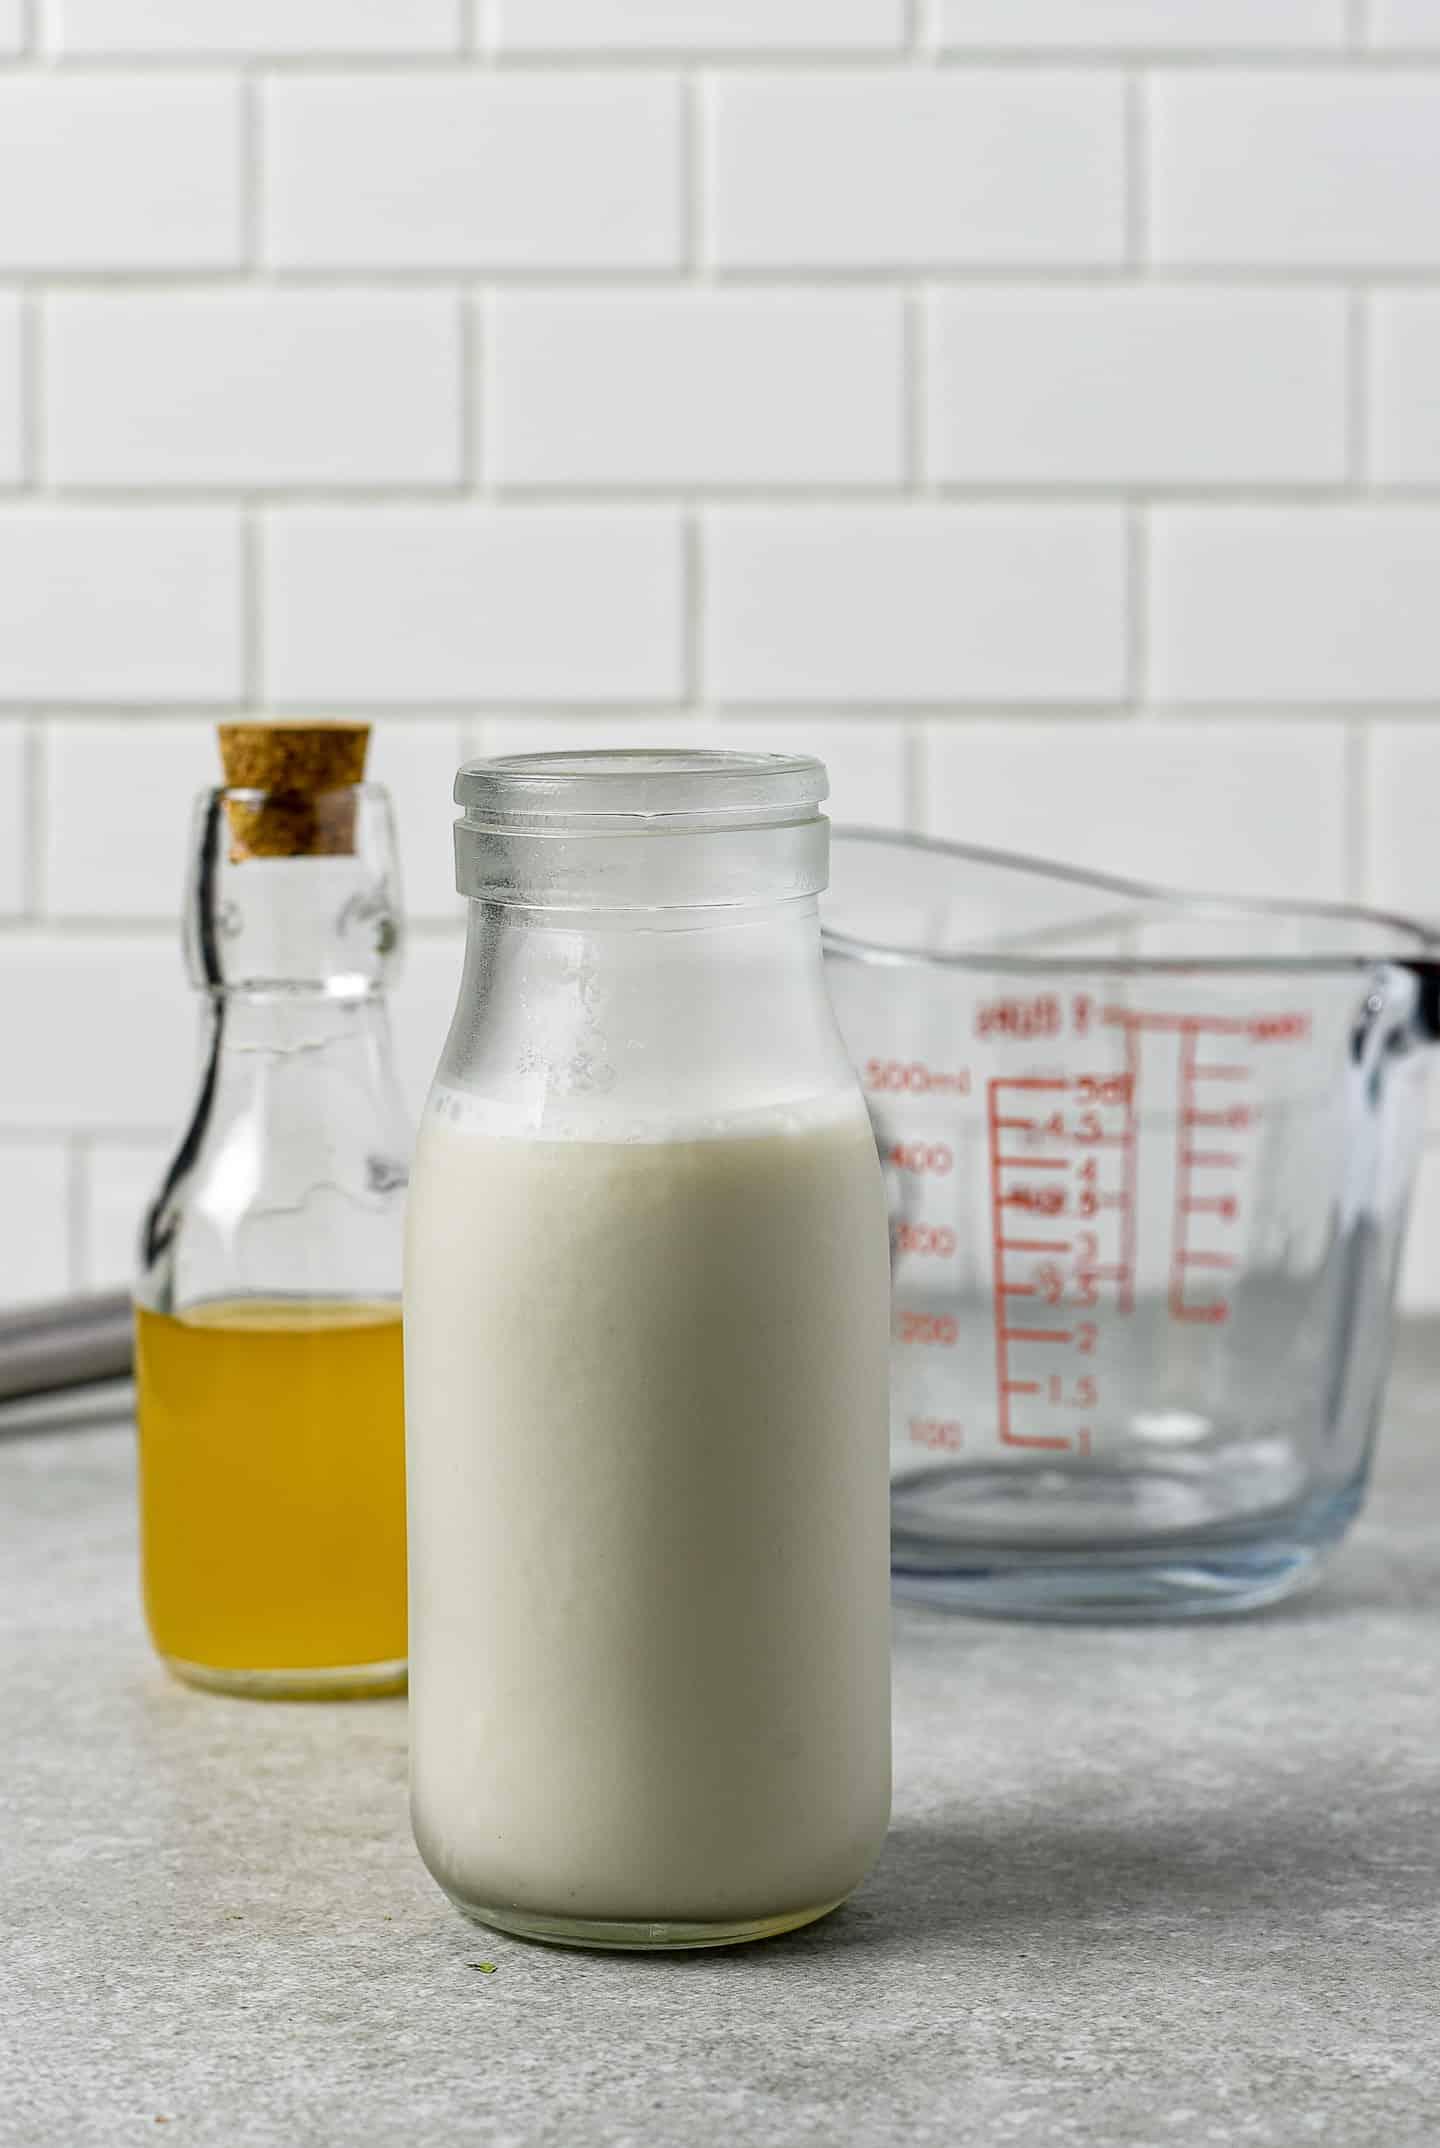 Almond milk, apple cider vinegar, and pyrex measuring cup.